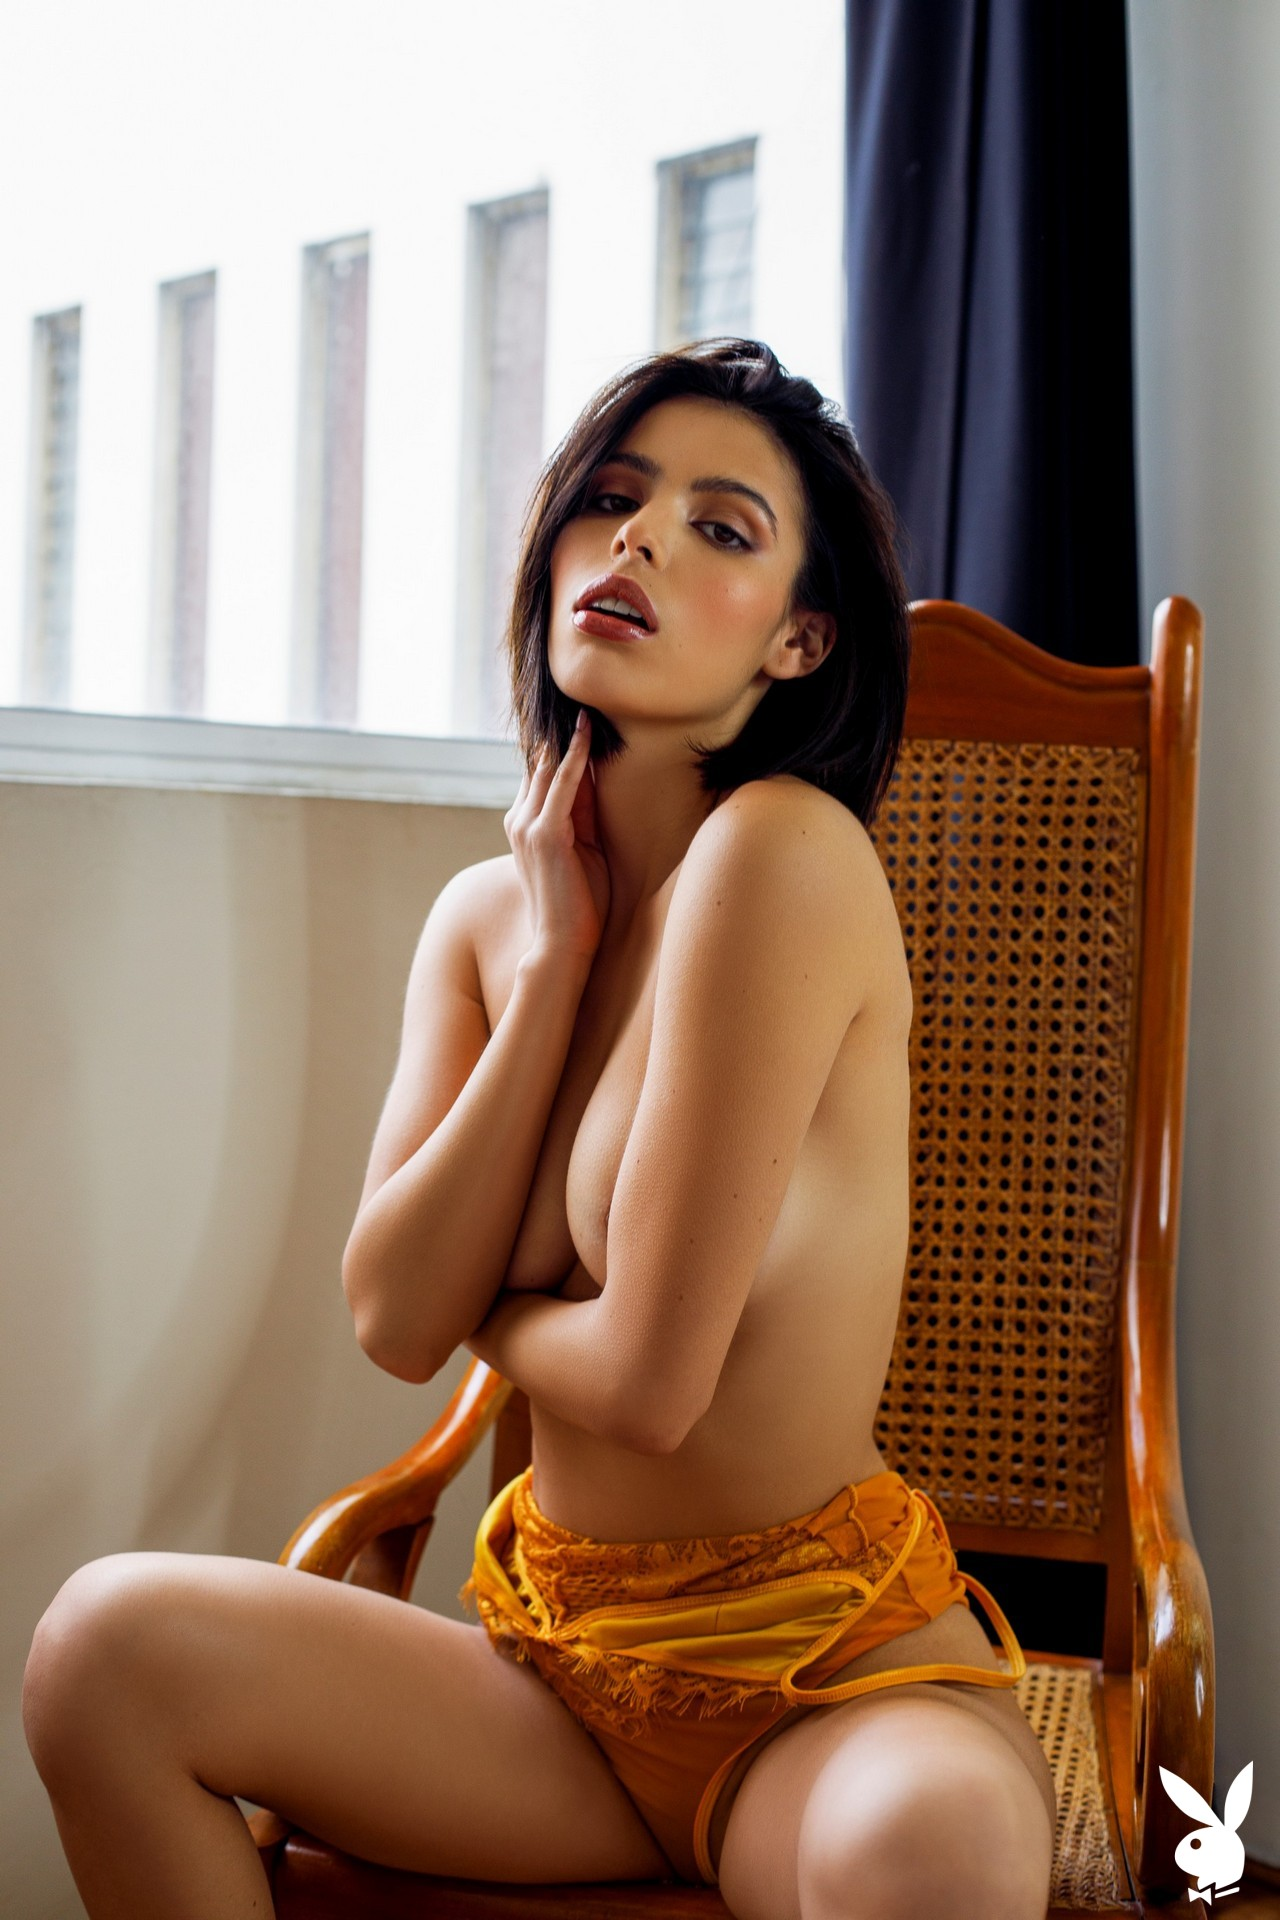 Fernanda Pacheco In Light Reading Playboy Plus (5)